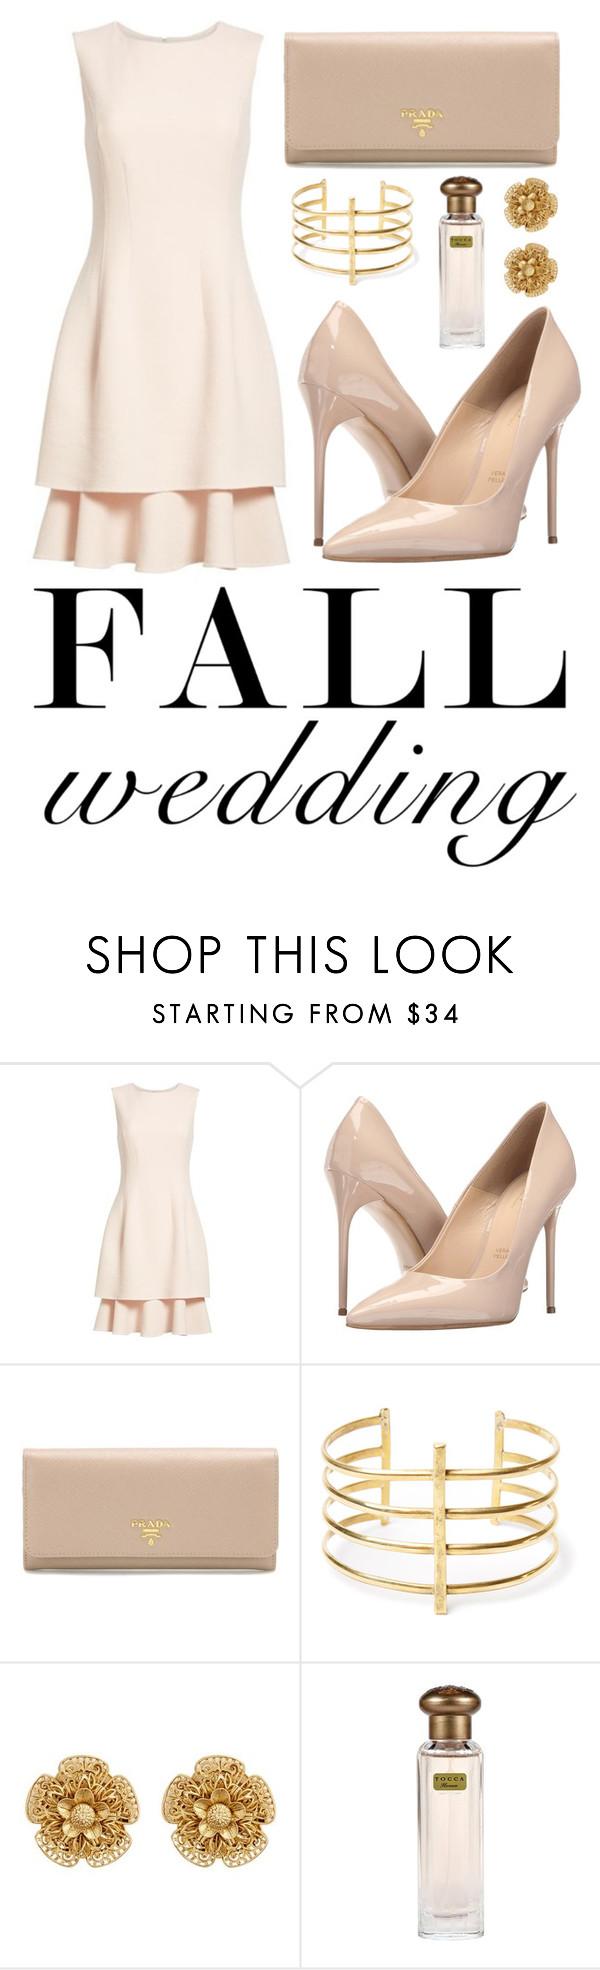 """Fall Wedding"" by hollyskinner01 ❤ liked on Polyvore featuring Oscar de la Renta, Massimo Matteo, Prada, BauXo and Miriam Haskell"